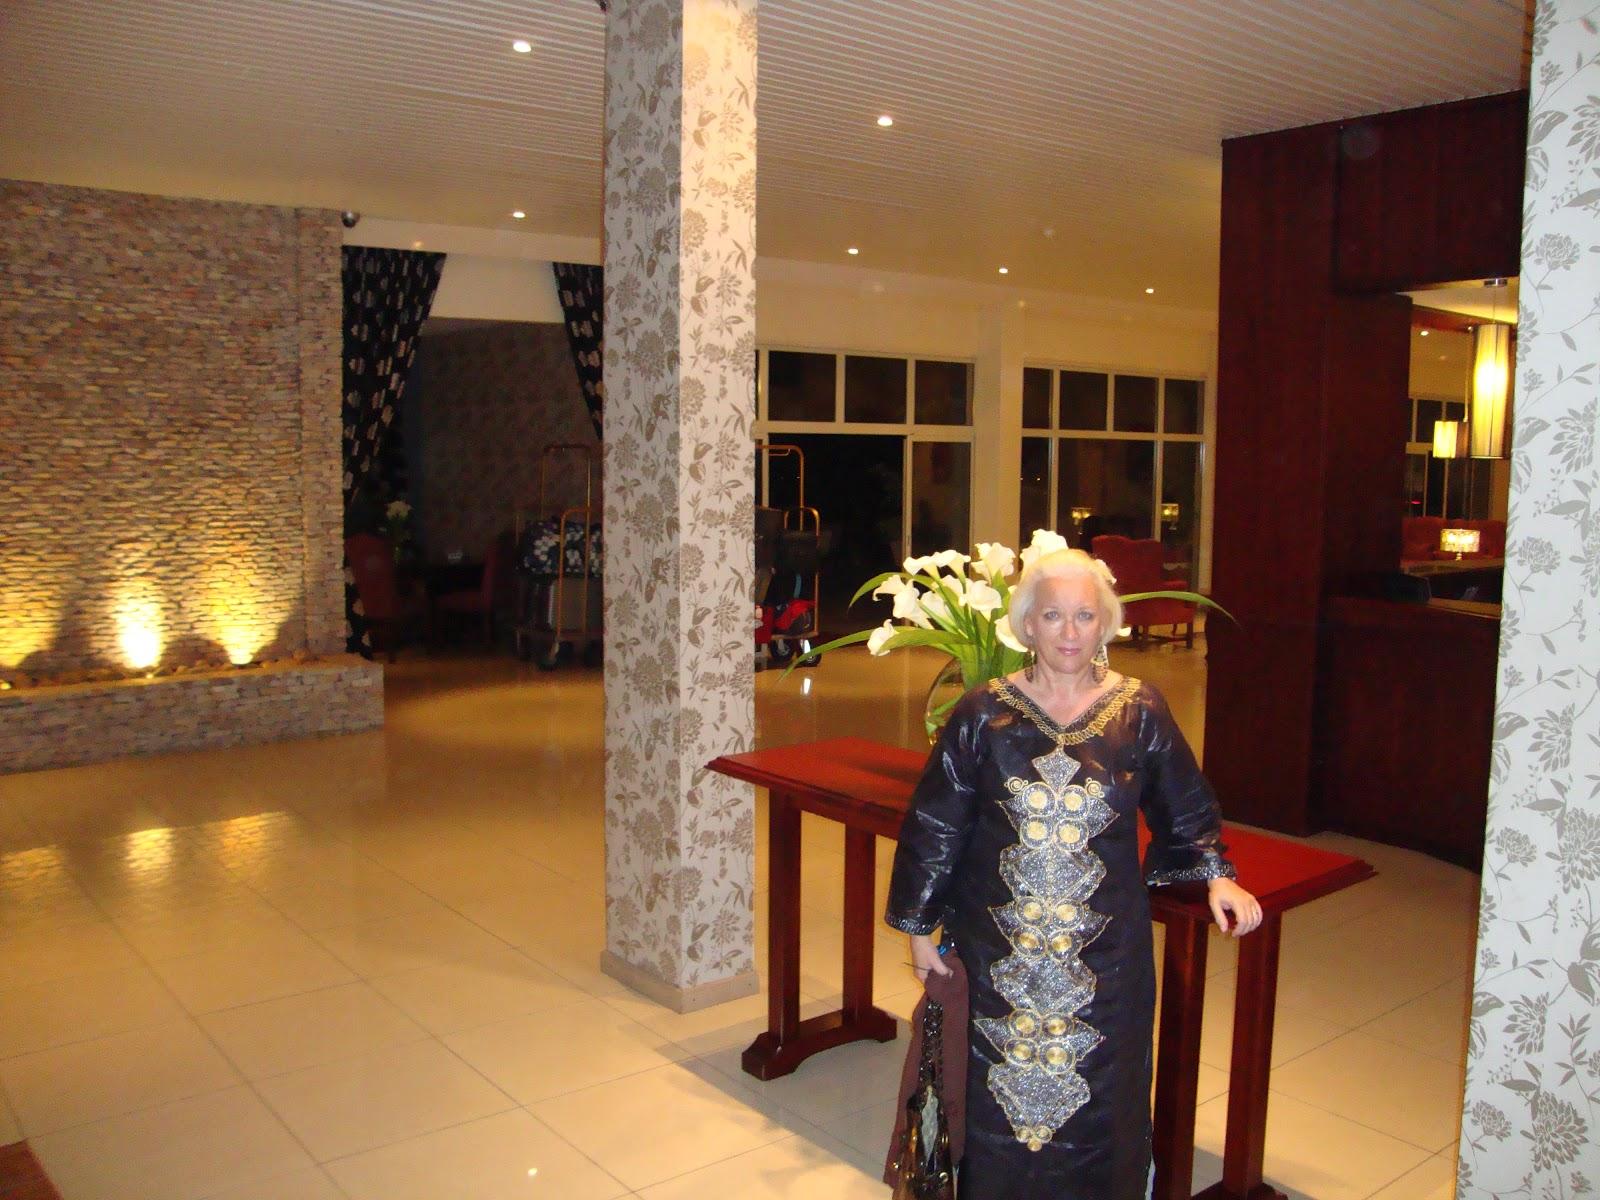 http://2.bp.blogspot.com/-7T0VMS5DPpk/T-QprPY-1-I/AAAAAAAAAQk/ET1vFZMbnoE/s1600/LD+Hotel+Lobby+2.JPG